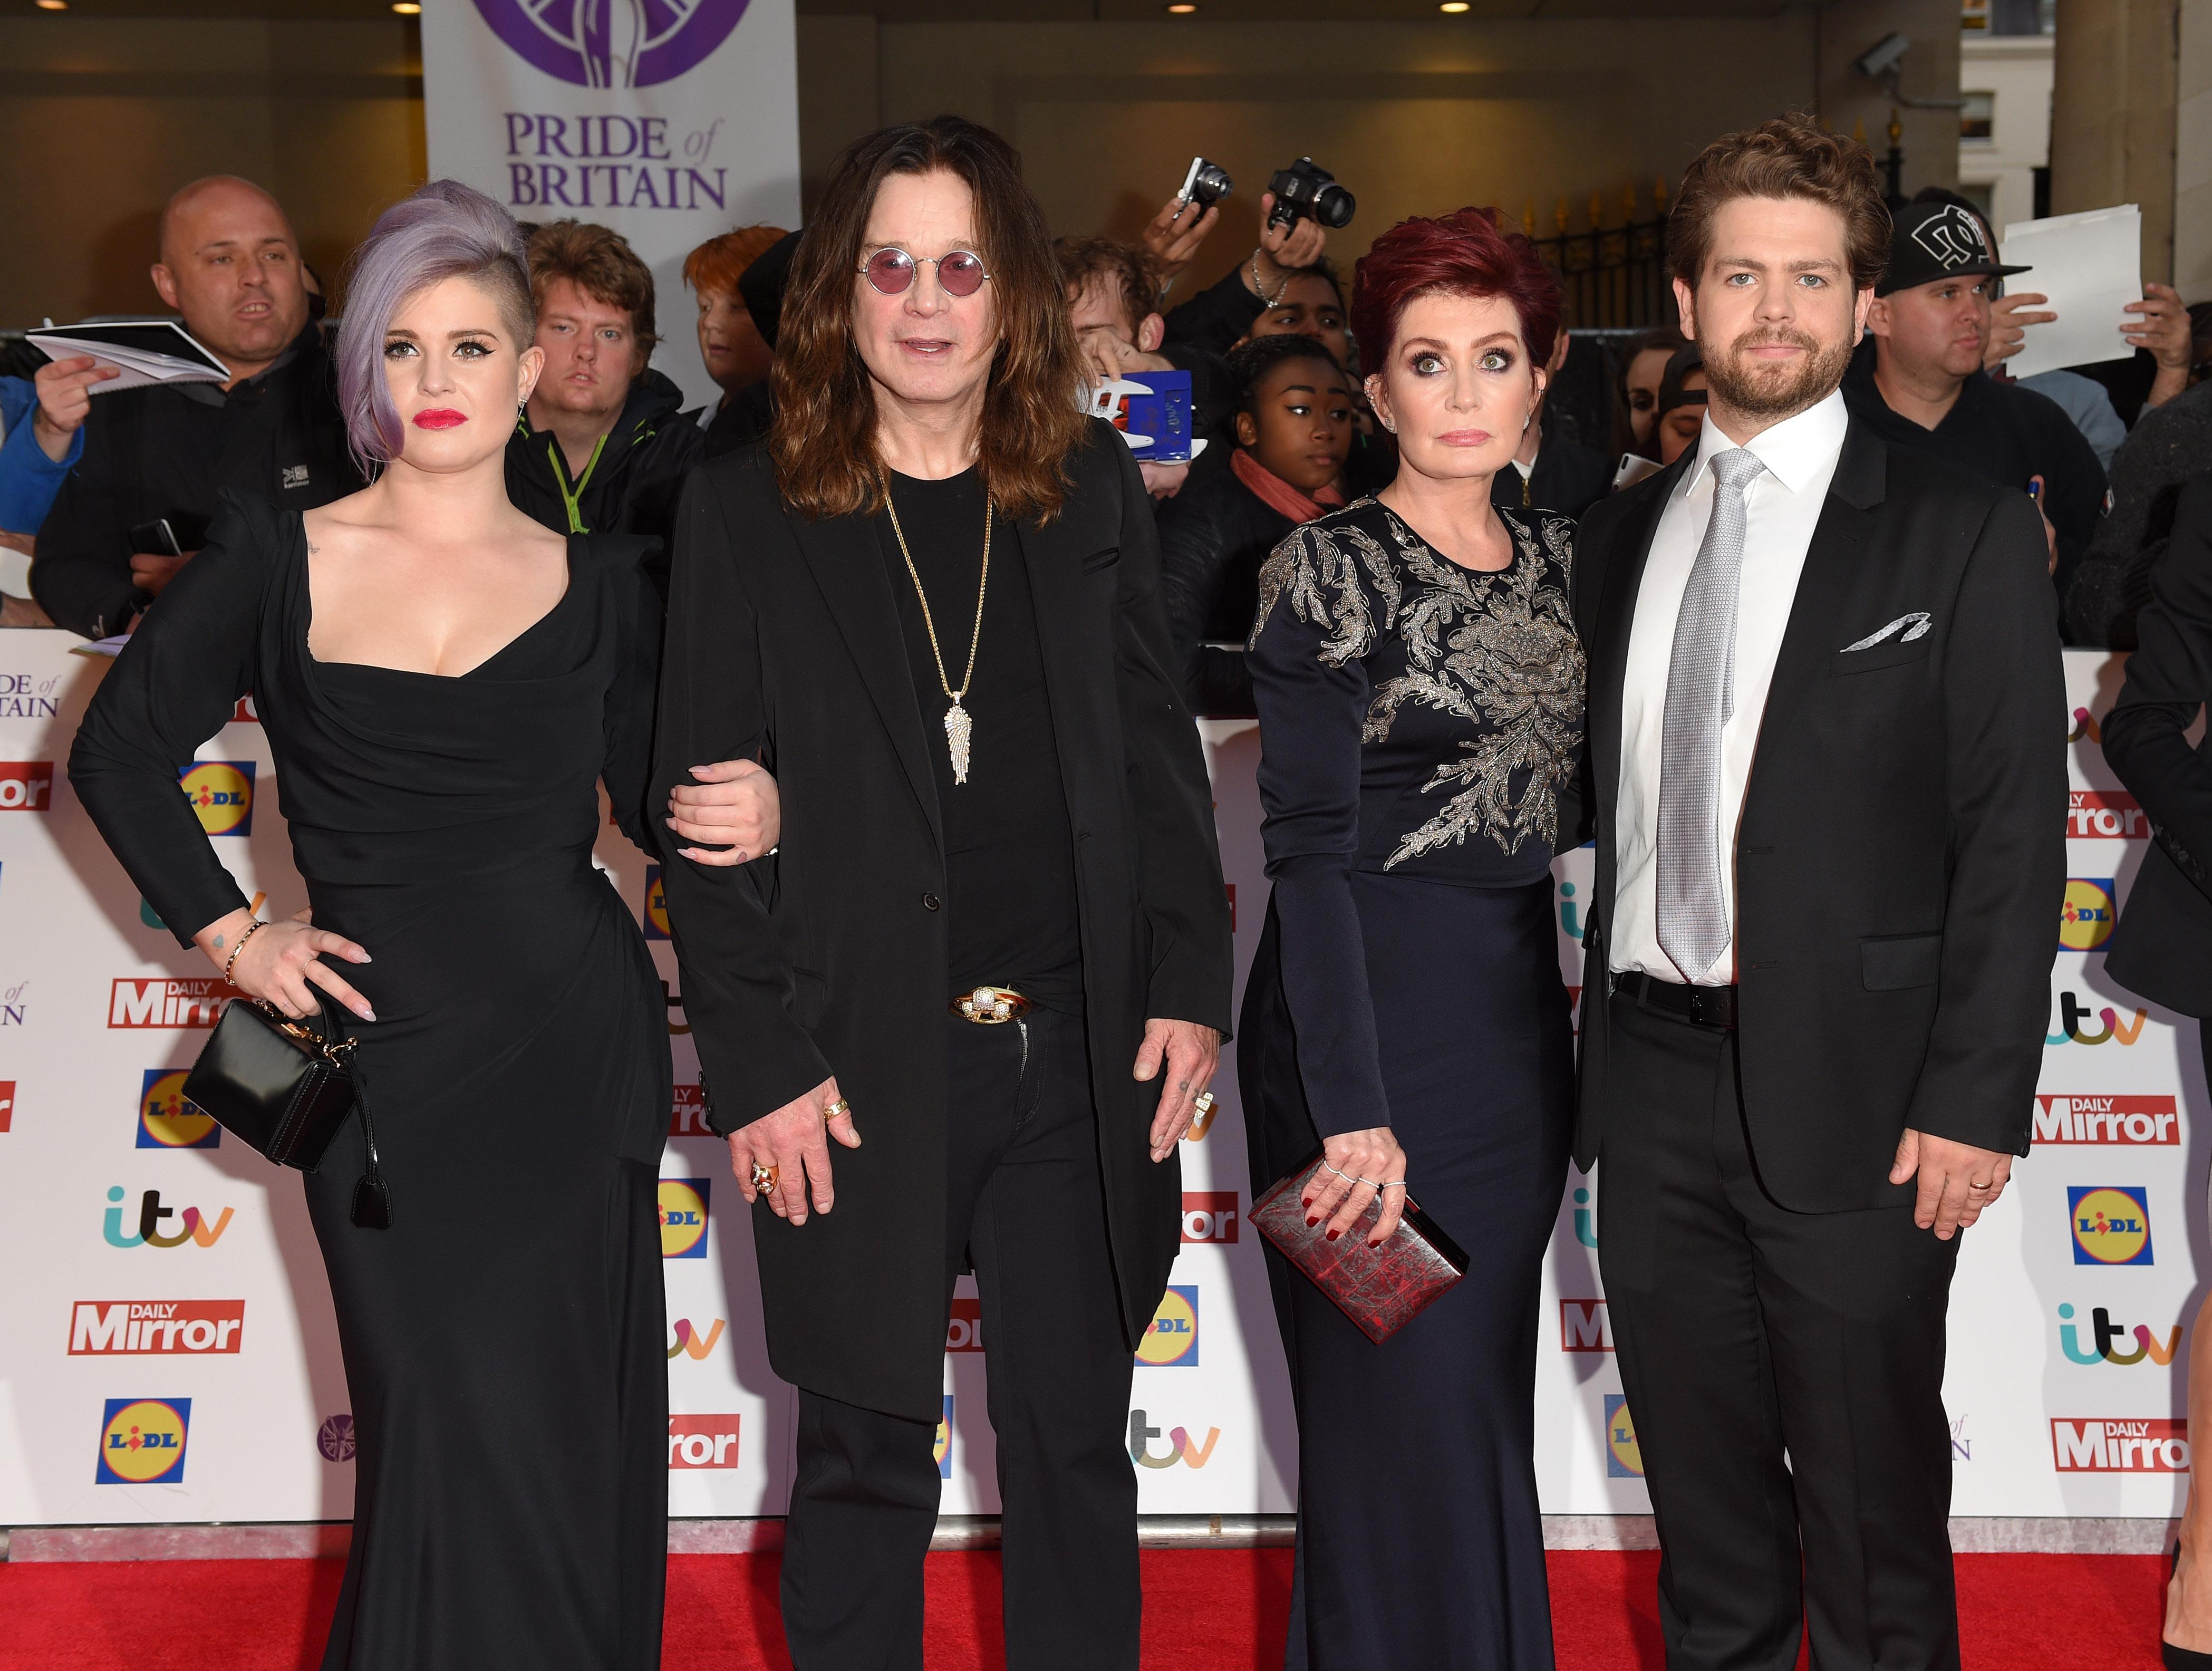 Ozzy Osbourne's children desperate to find their father after 'shock' affair revelations